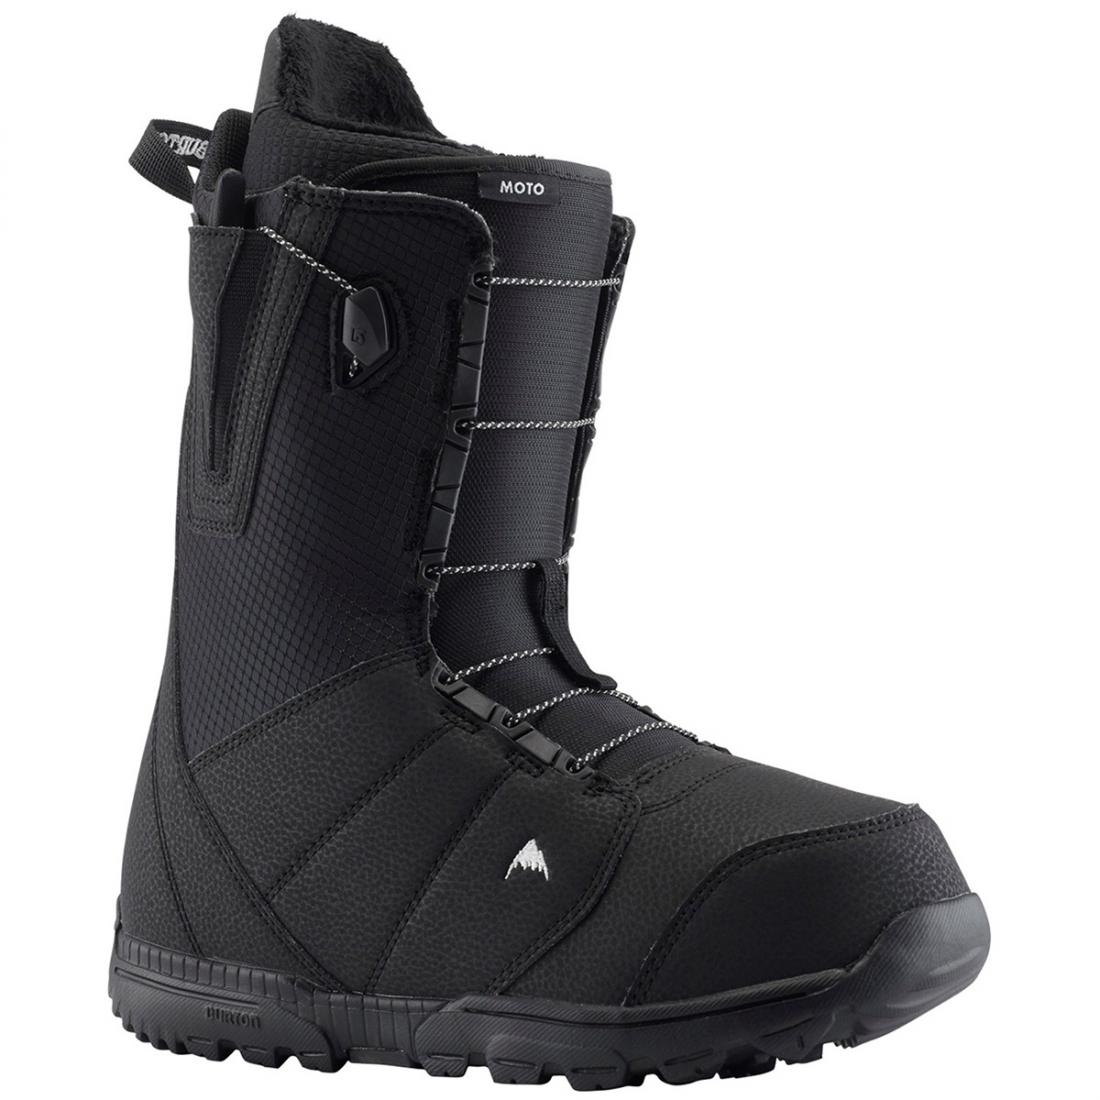 Ботинки сноубордические MOTO мужские